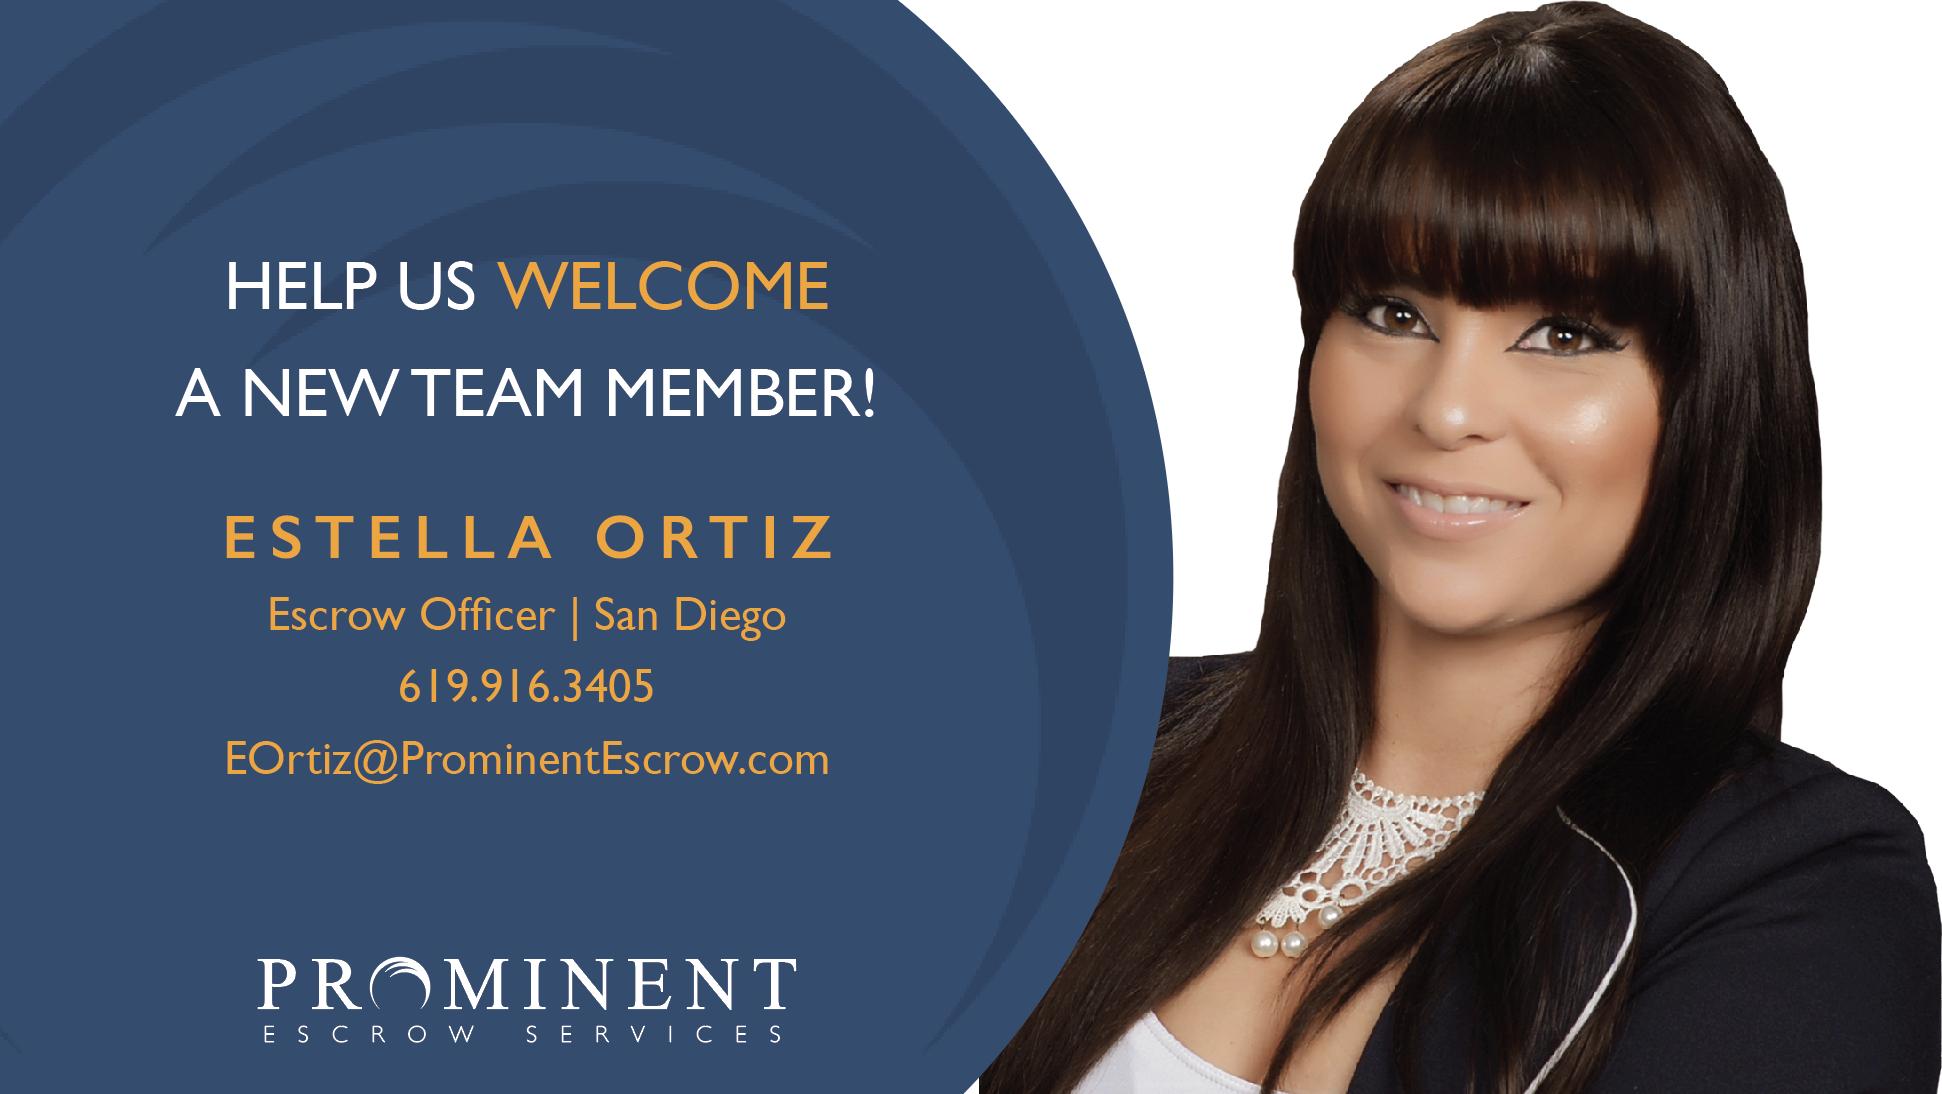 7-9-Welcome-Estella-Ortiz.jpg